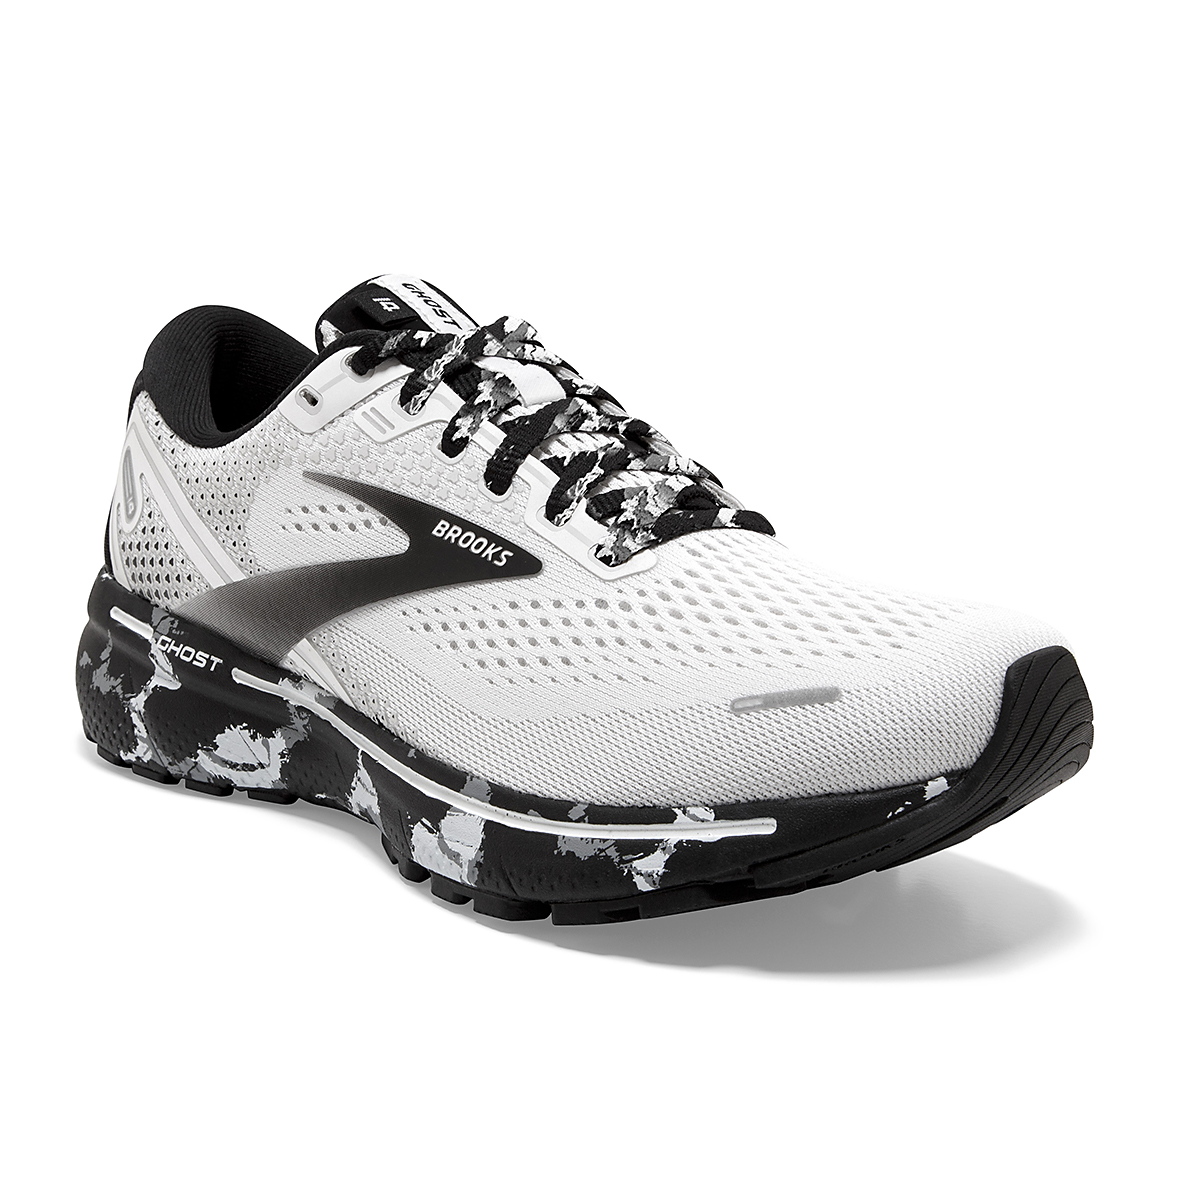 Women's Brooks Ghost 14 Running Shoe - Color: White/Grey/Black - Size: 5 - Width: Regular, White/Grey/Black, large, image 2